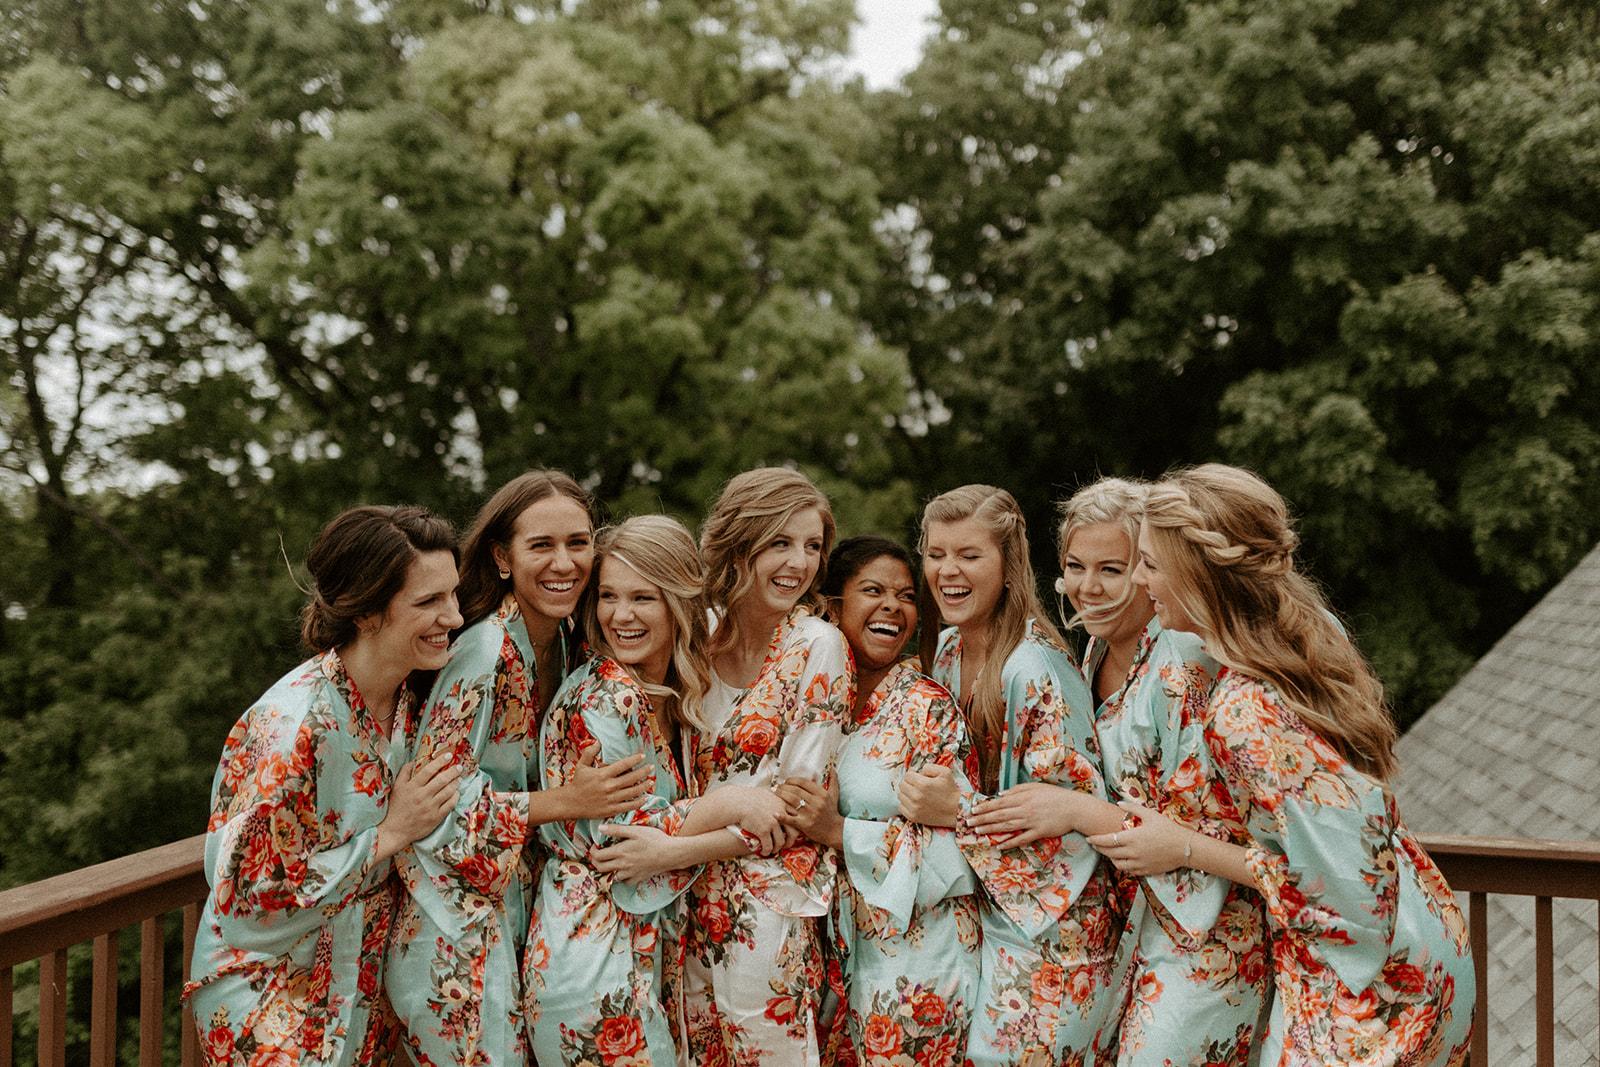 camp_wokanda_peoria_illinois_wedding_photographer_wright_photographs_bliese_0010.jpg